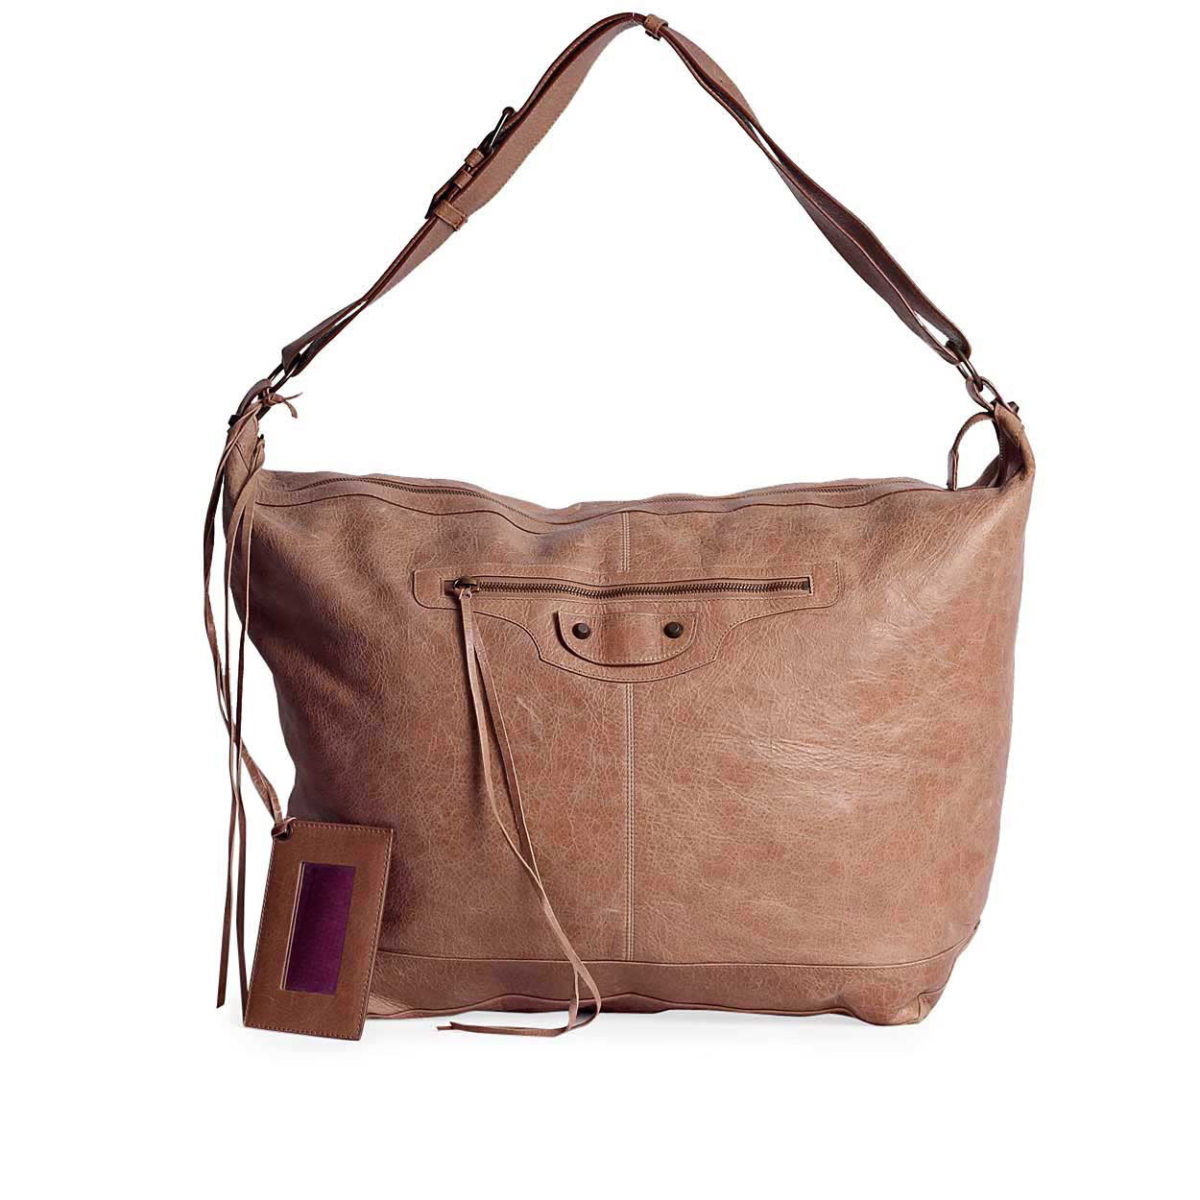 315515288b27 BALENCIAGA Classic Day Bag brown